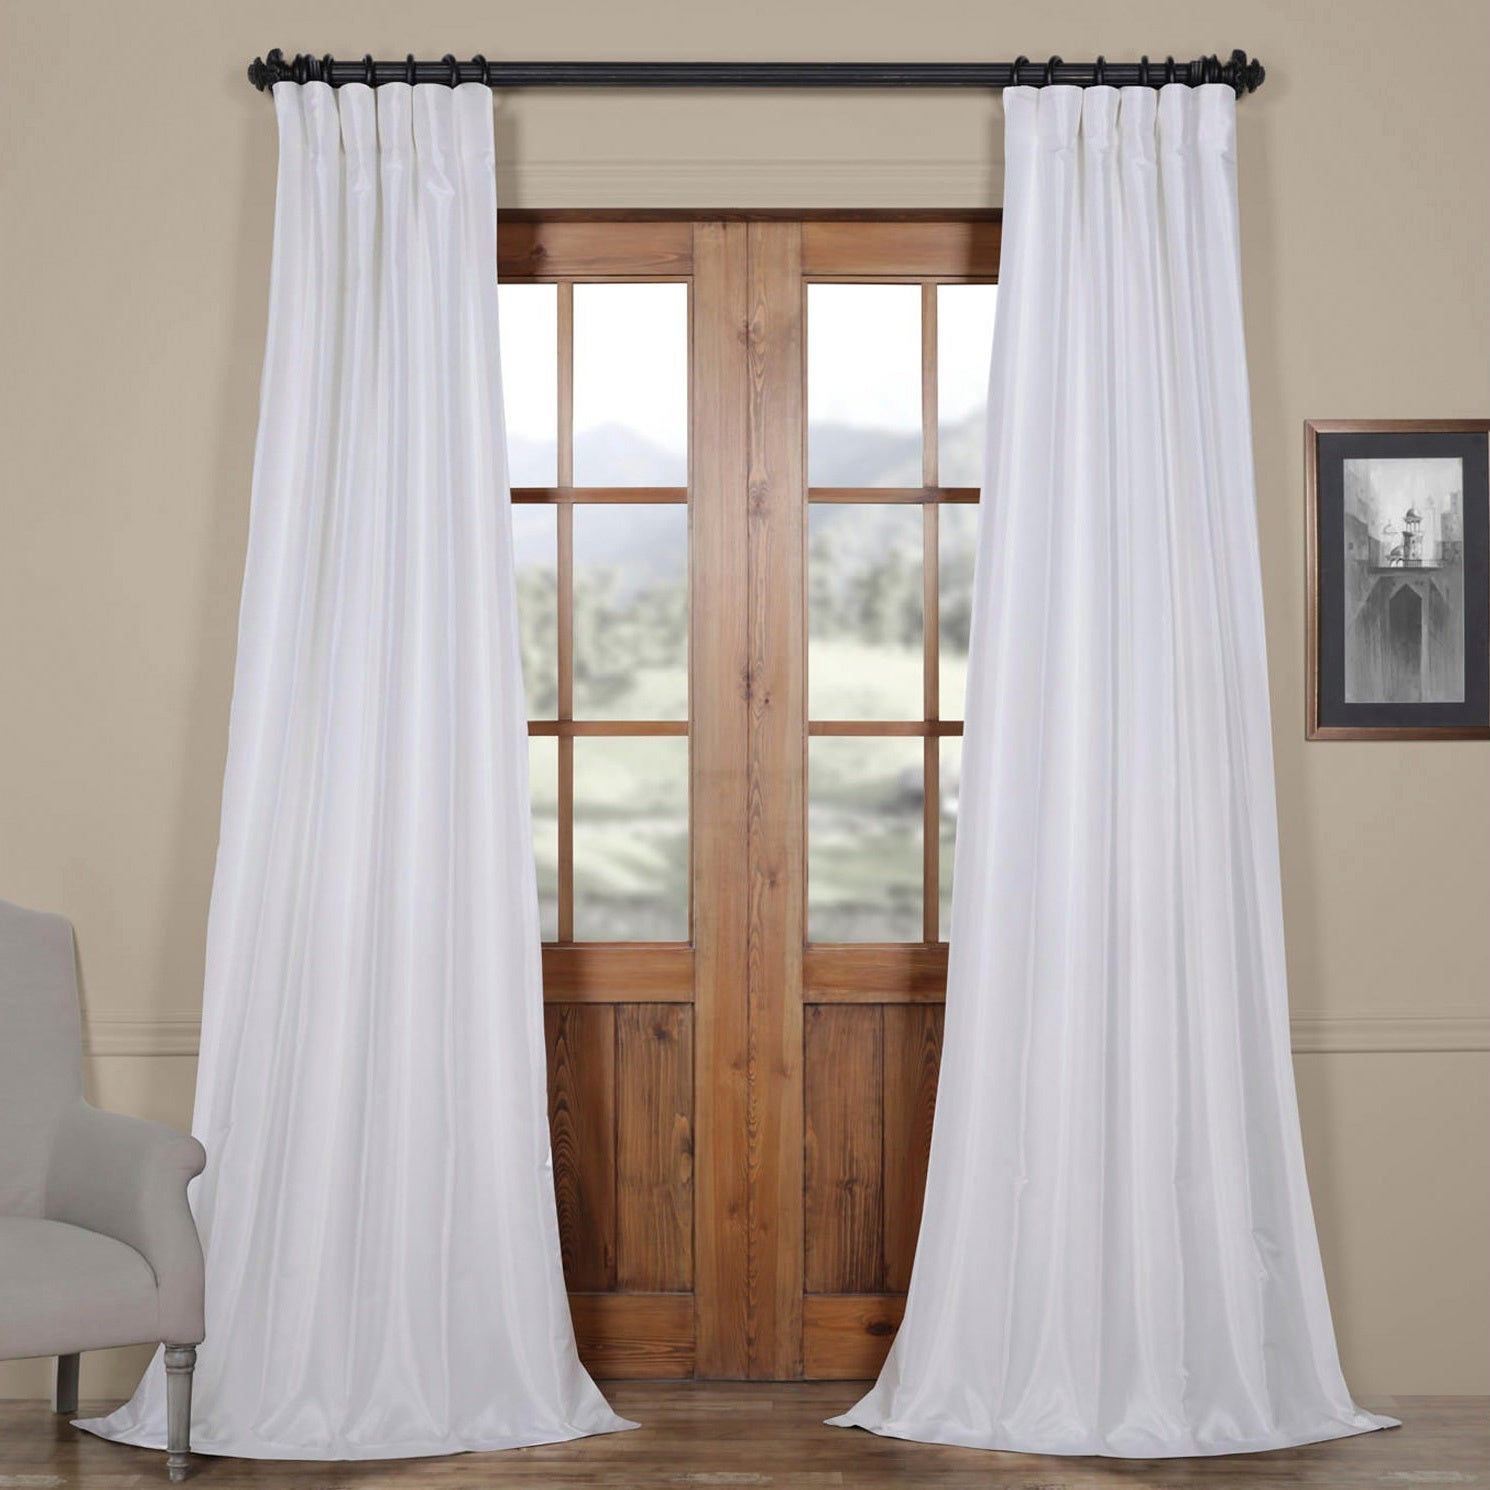 Ice White Vintage Faux Textured Dupioni Silk 108l Curtain Panel Pertaining To Vintage Faux Textured Dupioni Silk Curtain Panels (View 3 of 30)